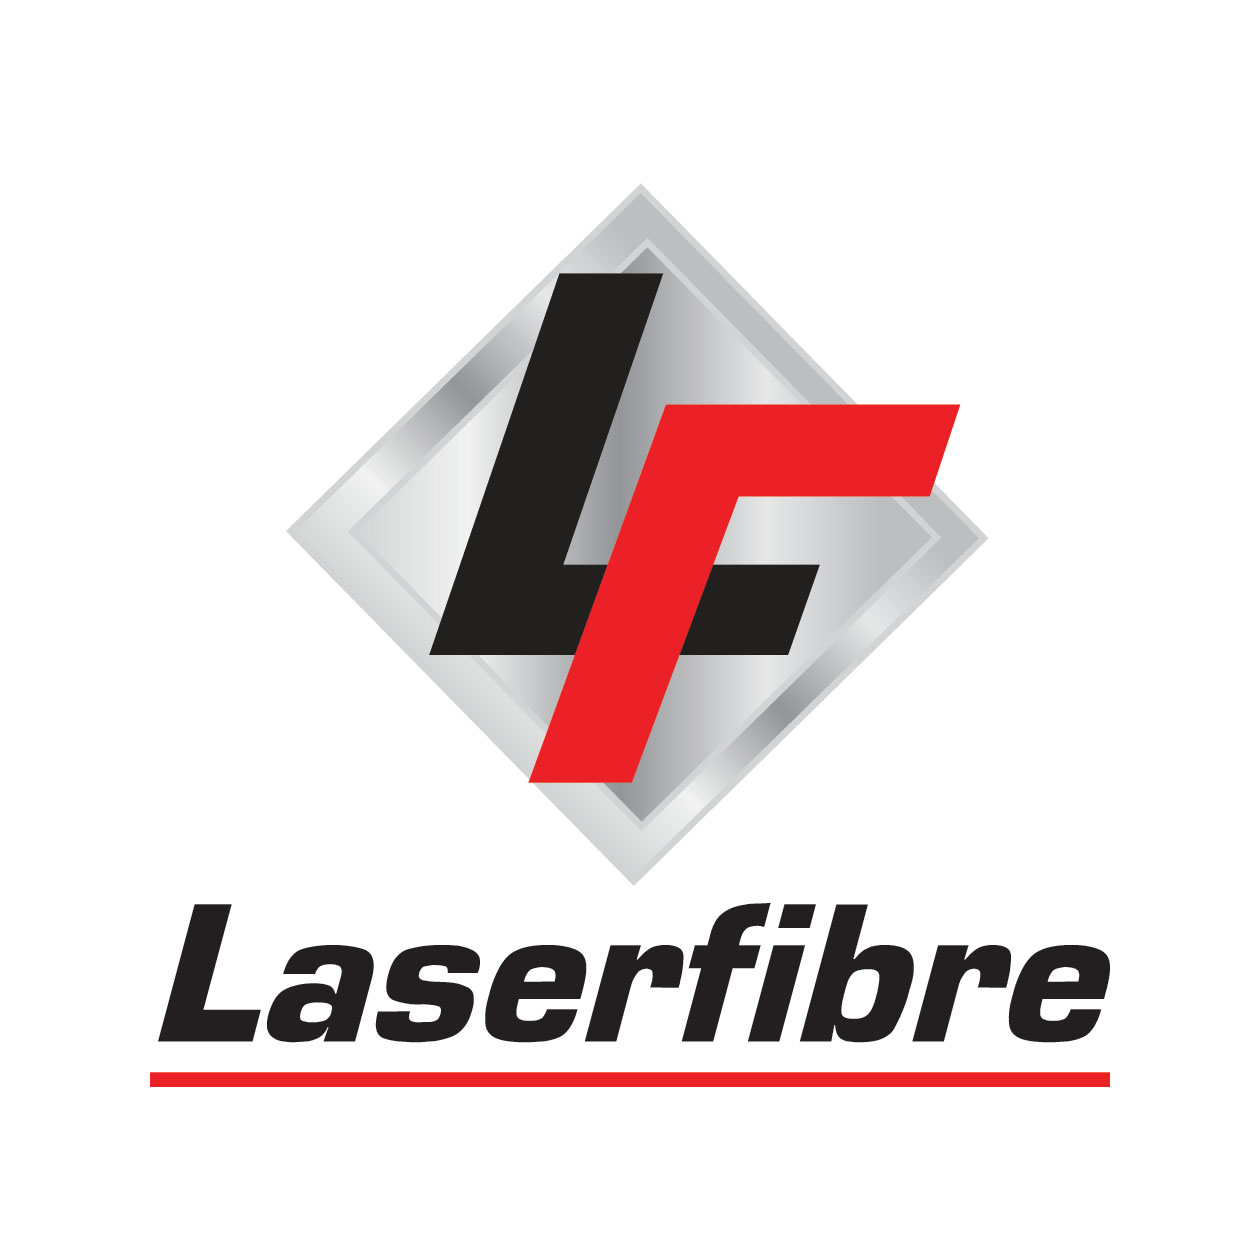 Laserfibre